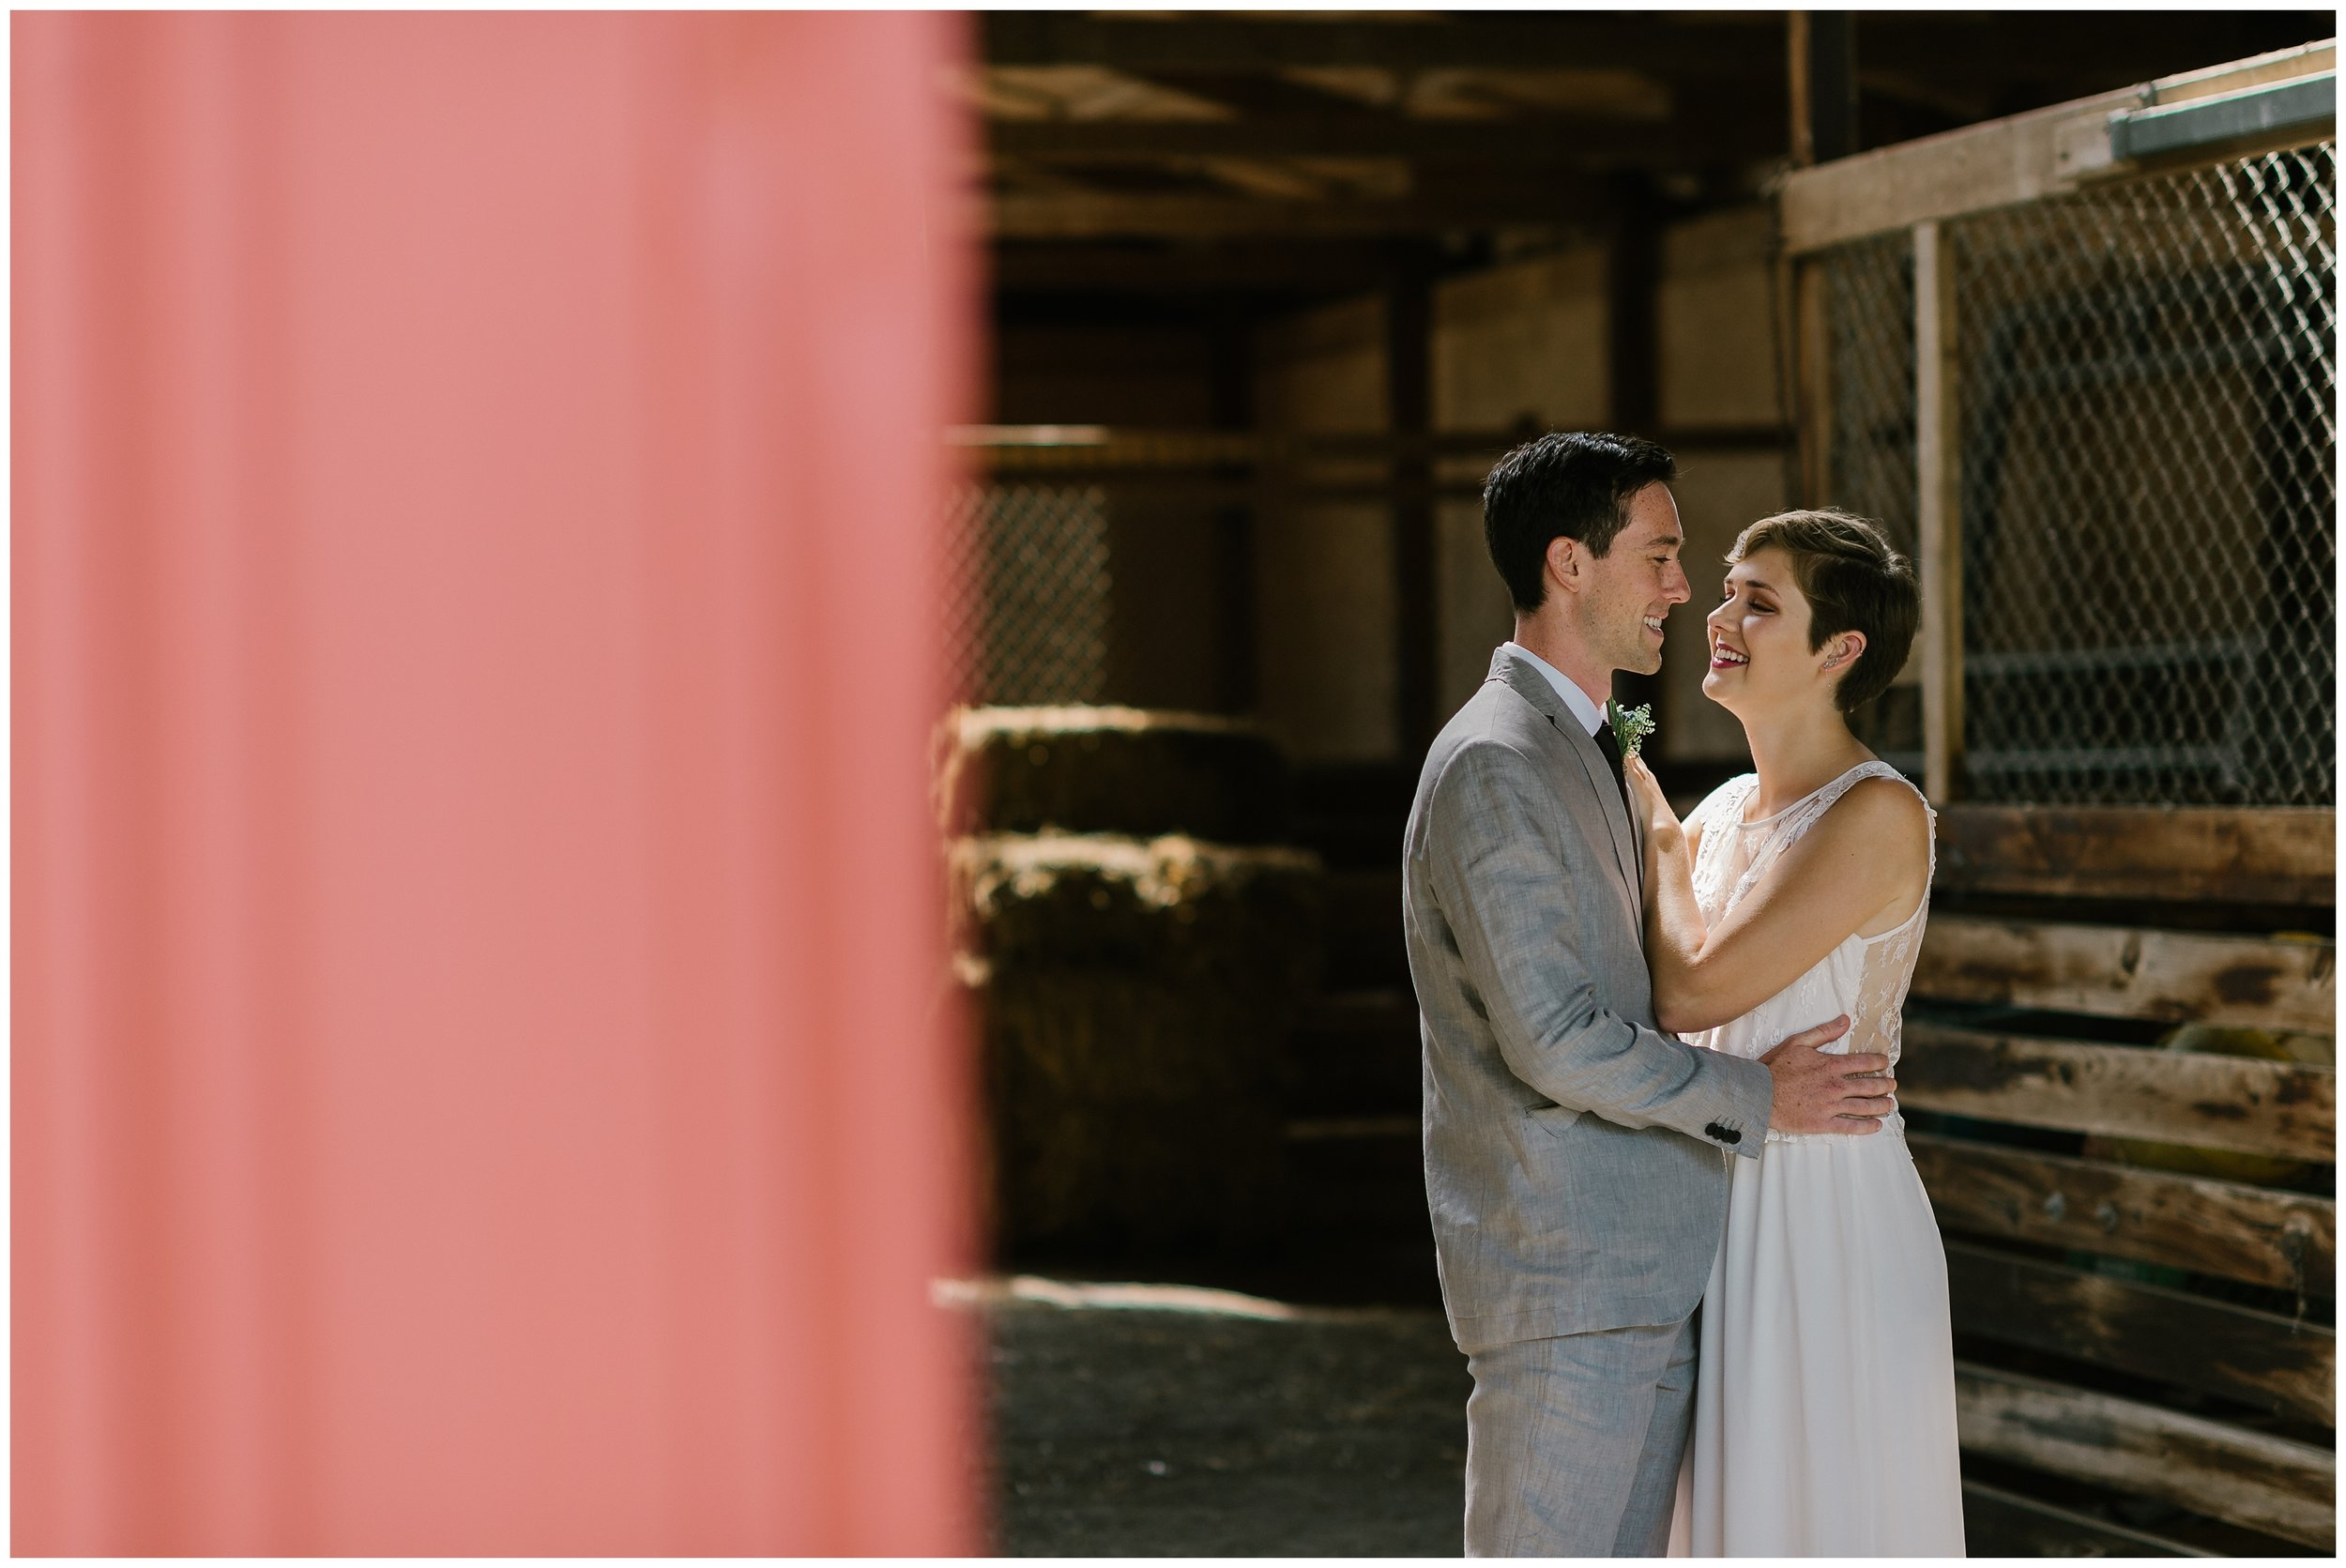 Rebecca_Shehorn_Photography_Indianapolis_Wedding_Photographer_7226.jpg